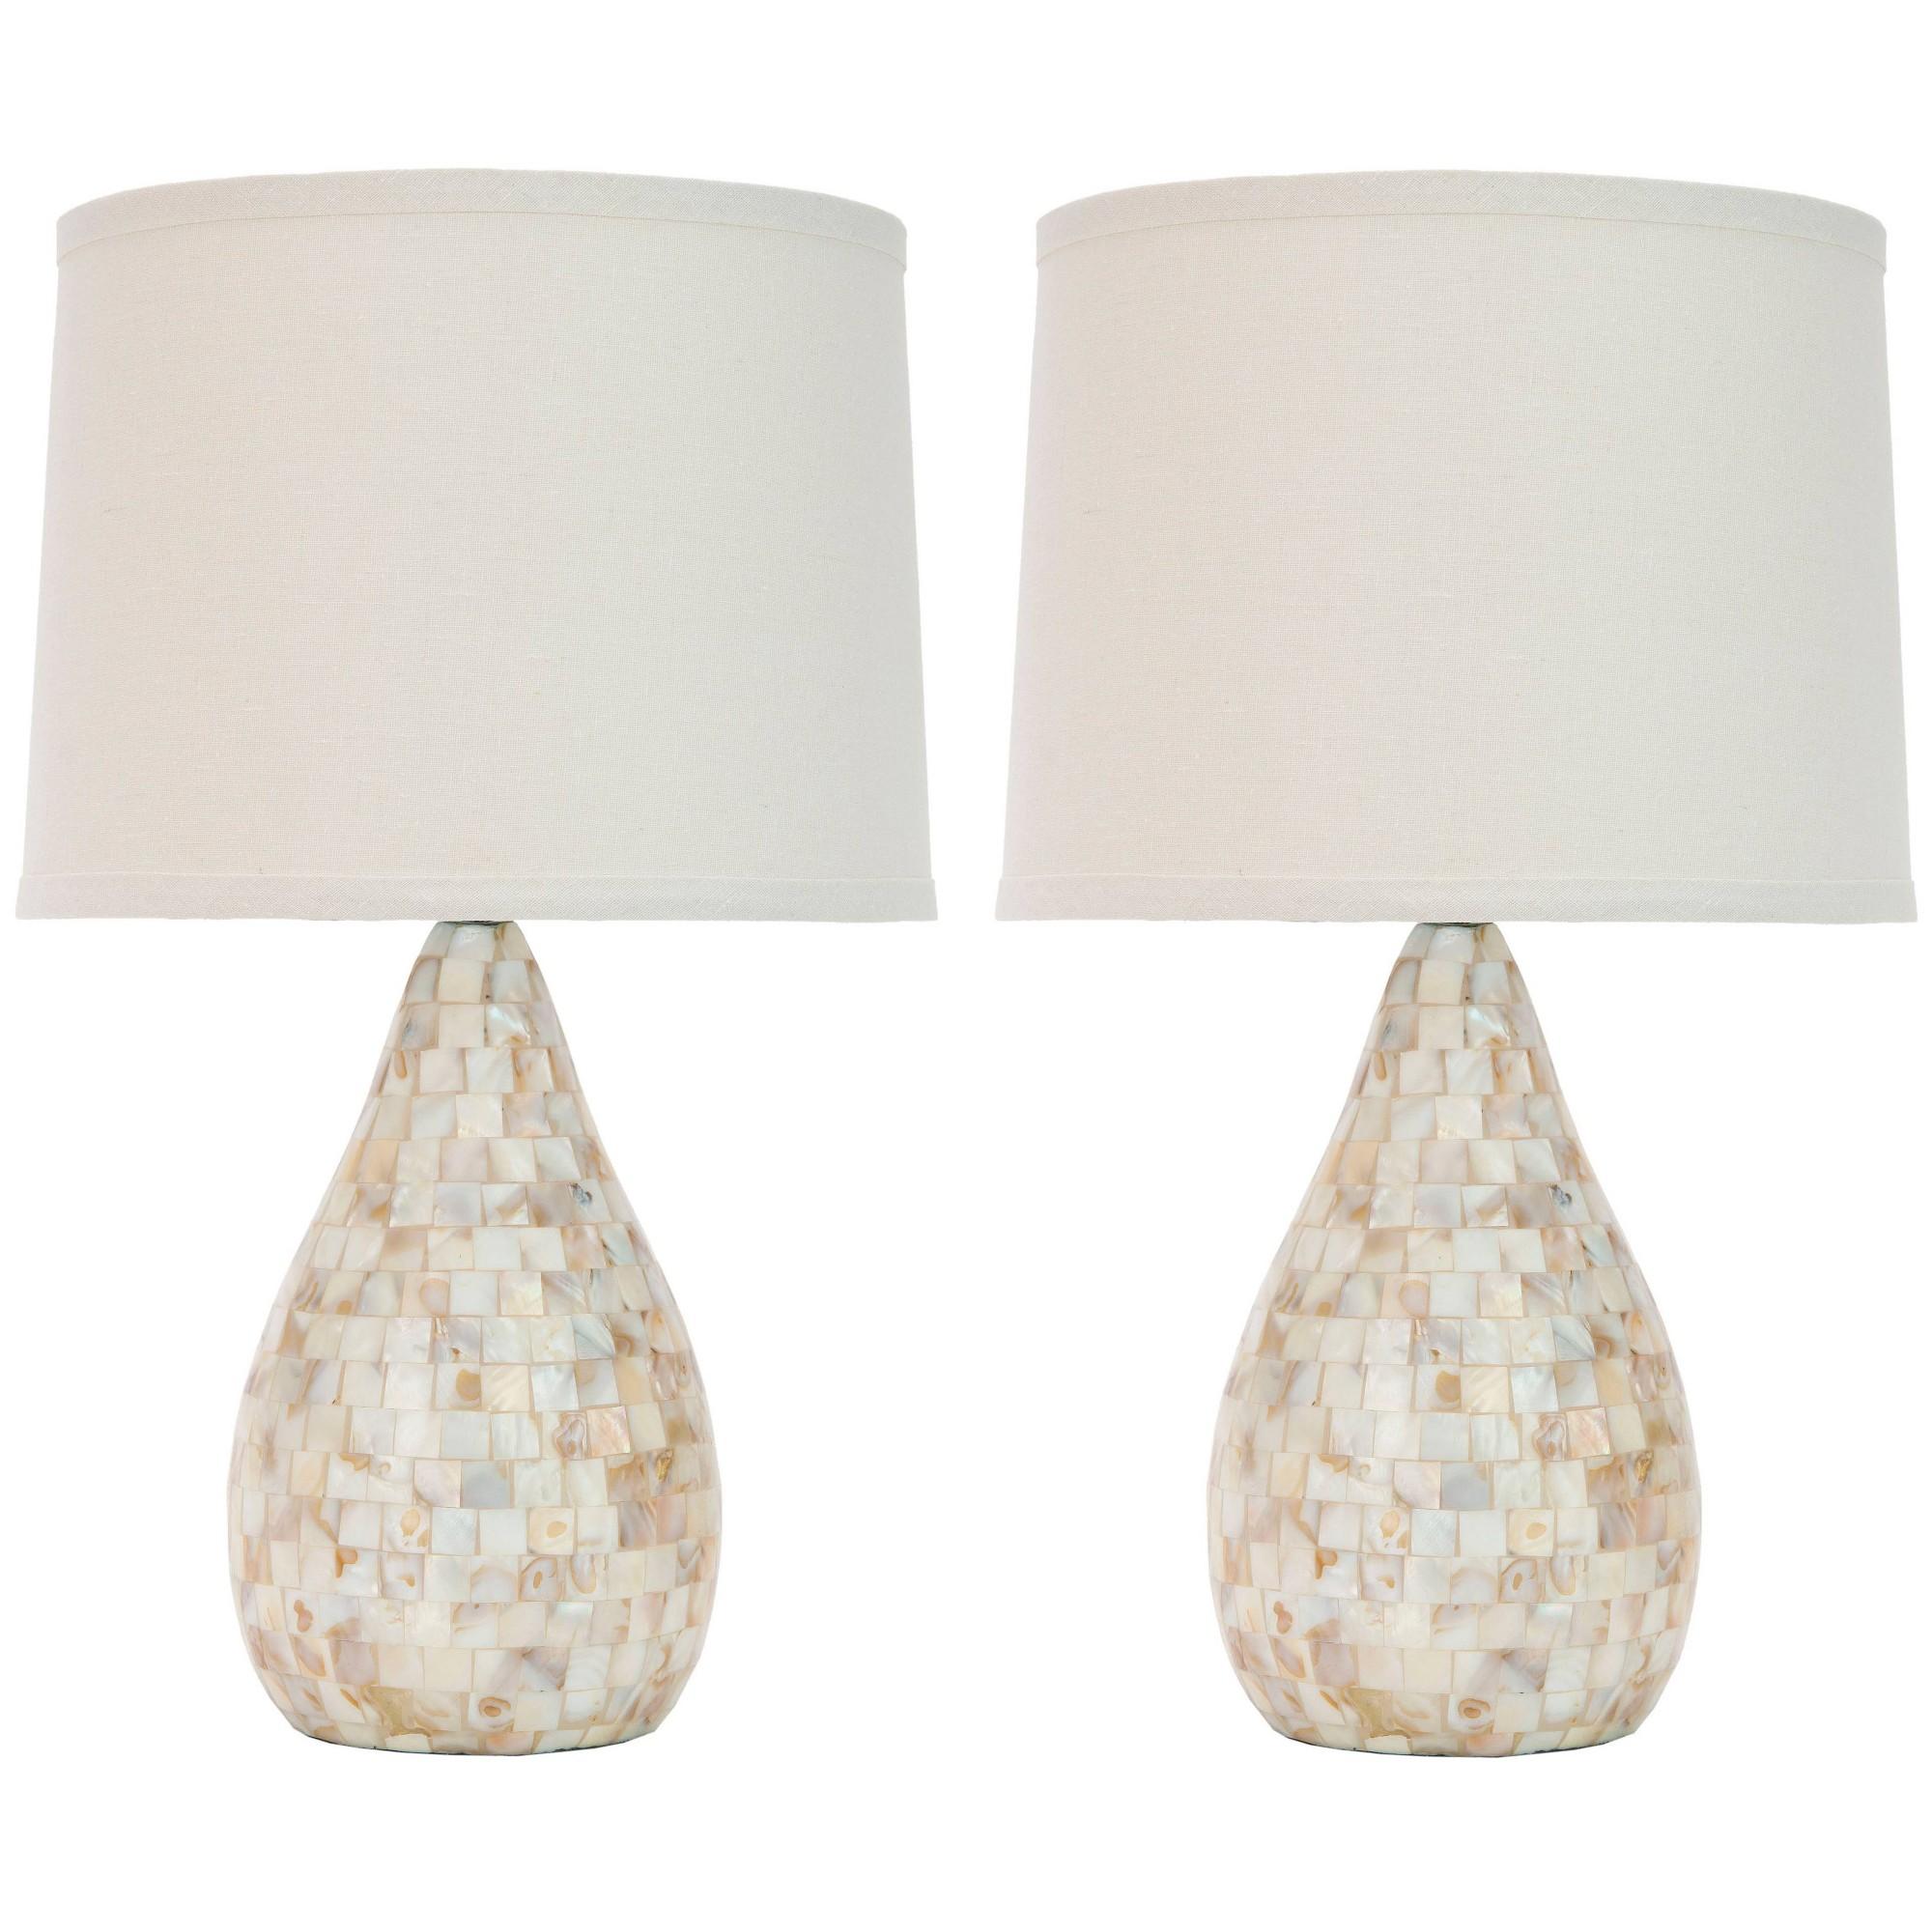 Safavieh Norwich Table Lamp (Set of 2)